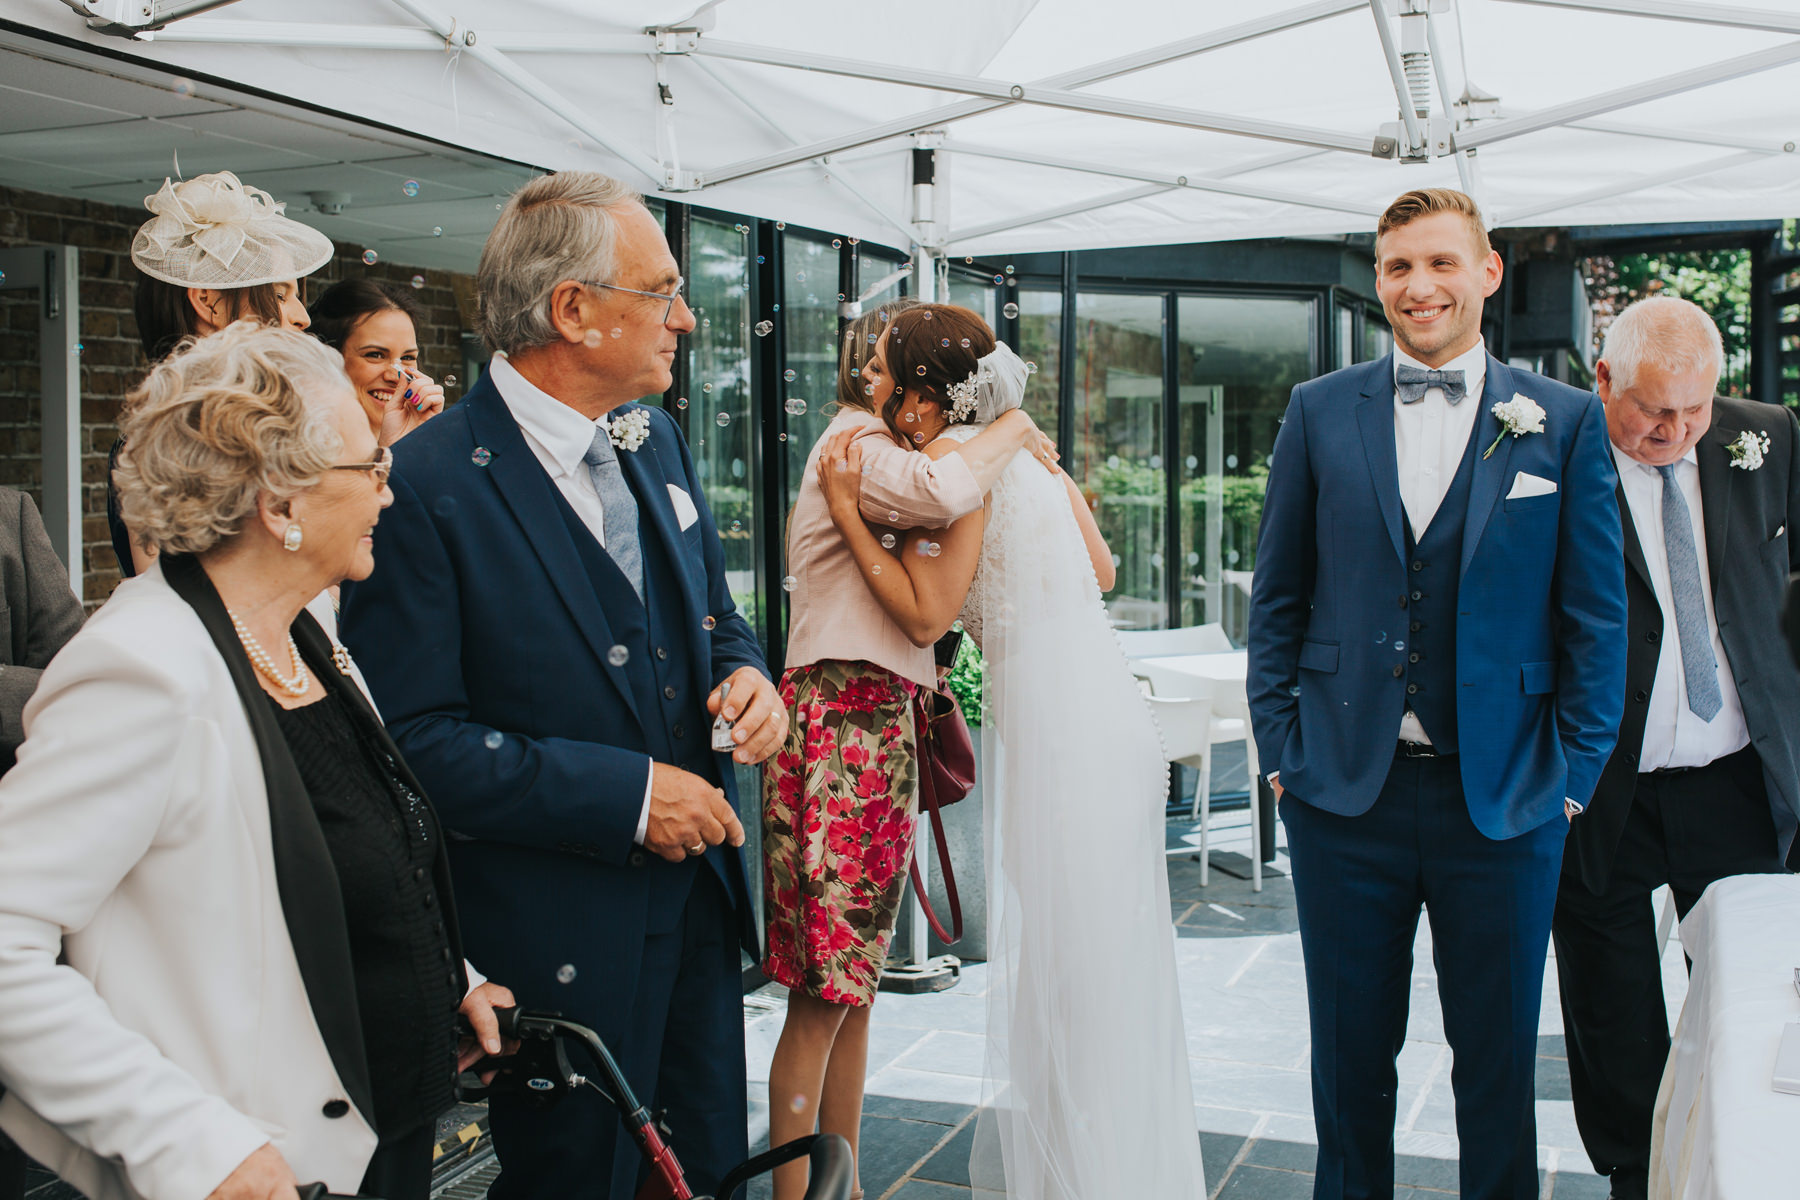 CRL-235-The Bingham Wedding Richmond-groom bride guests blowing bubbles.jpg